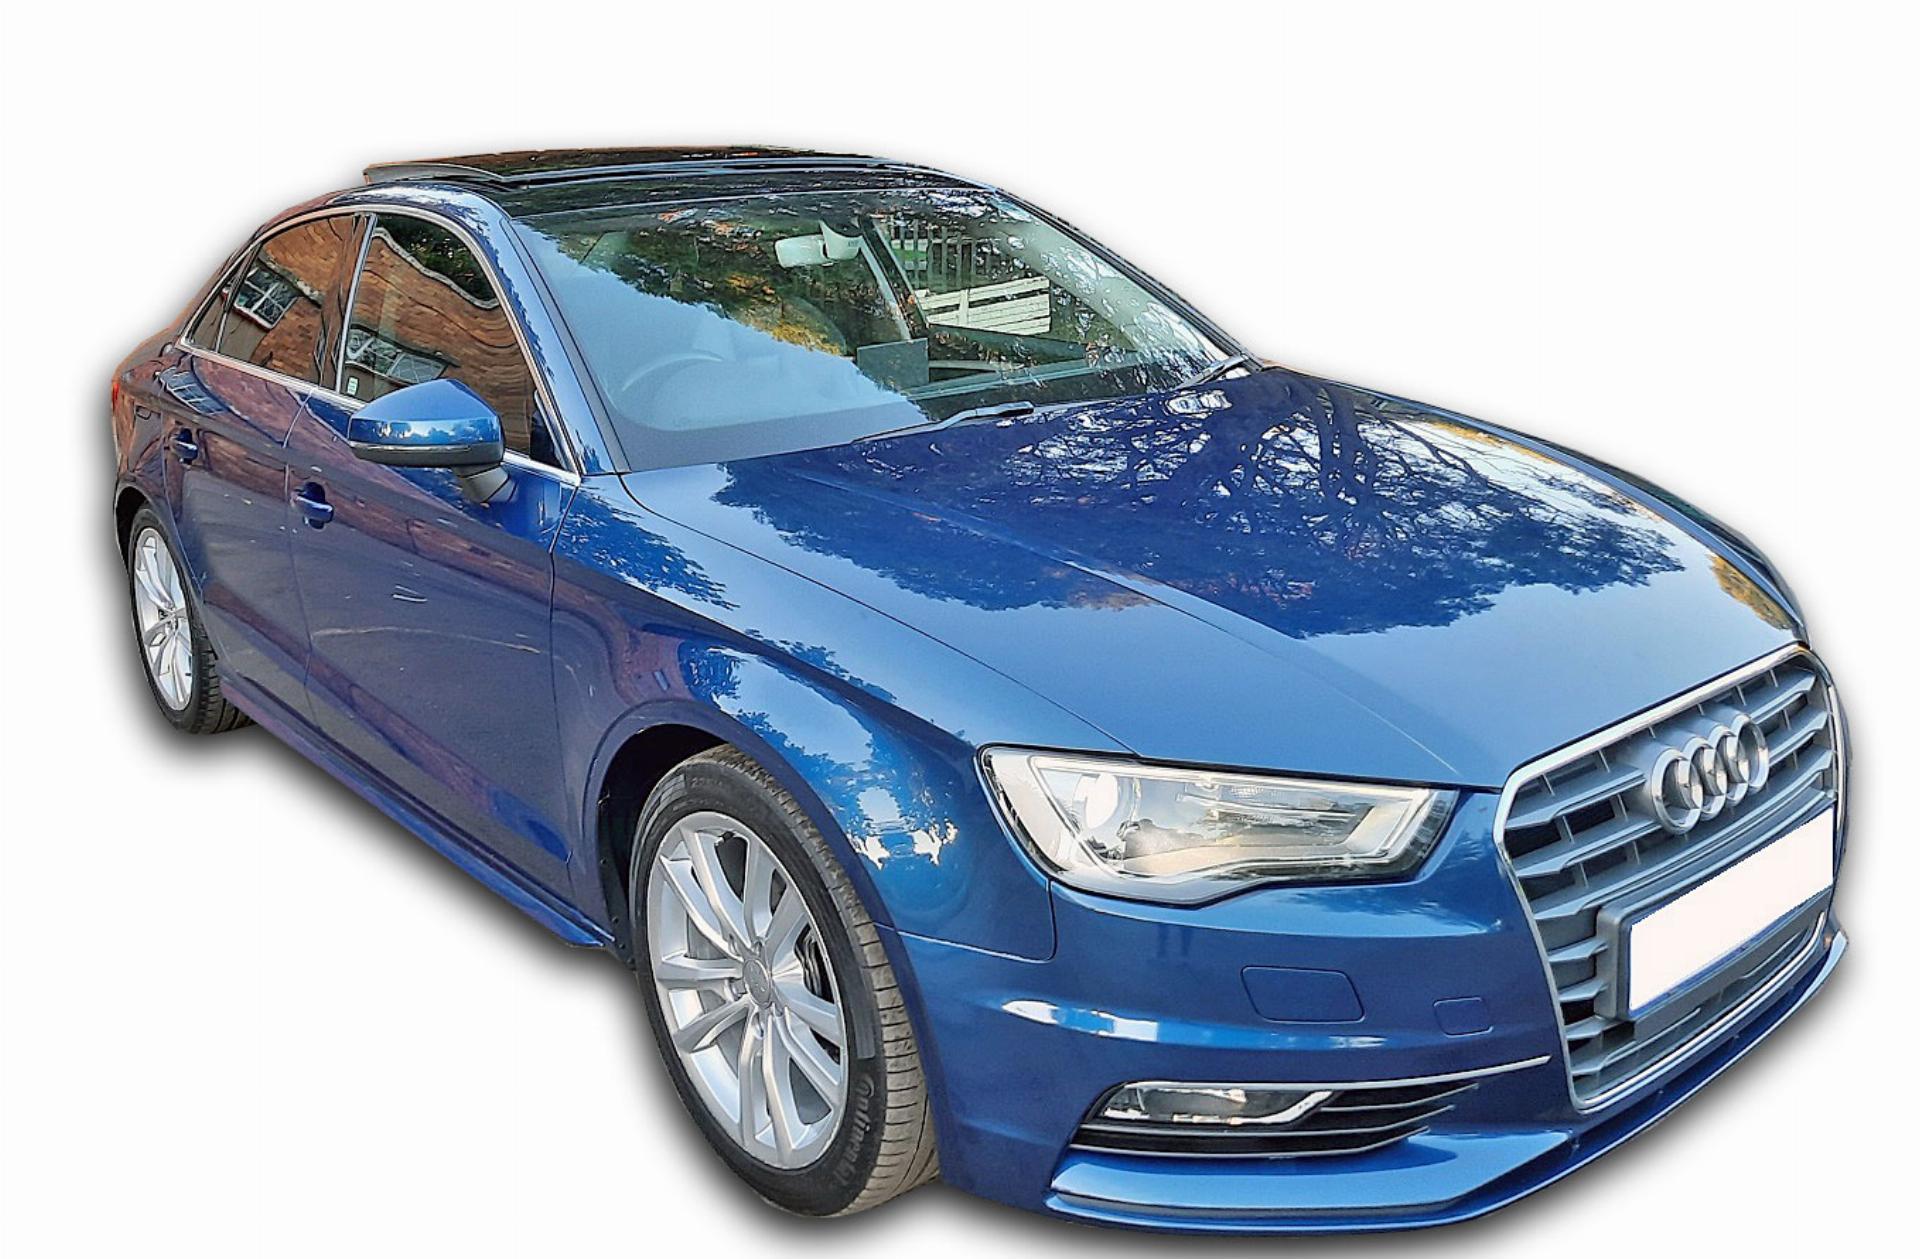 A3 Audi 2.0TDI